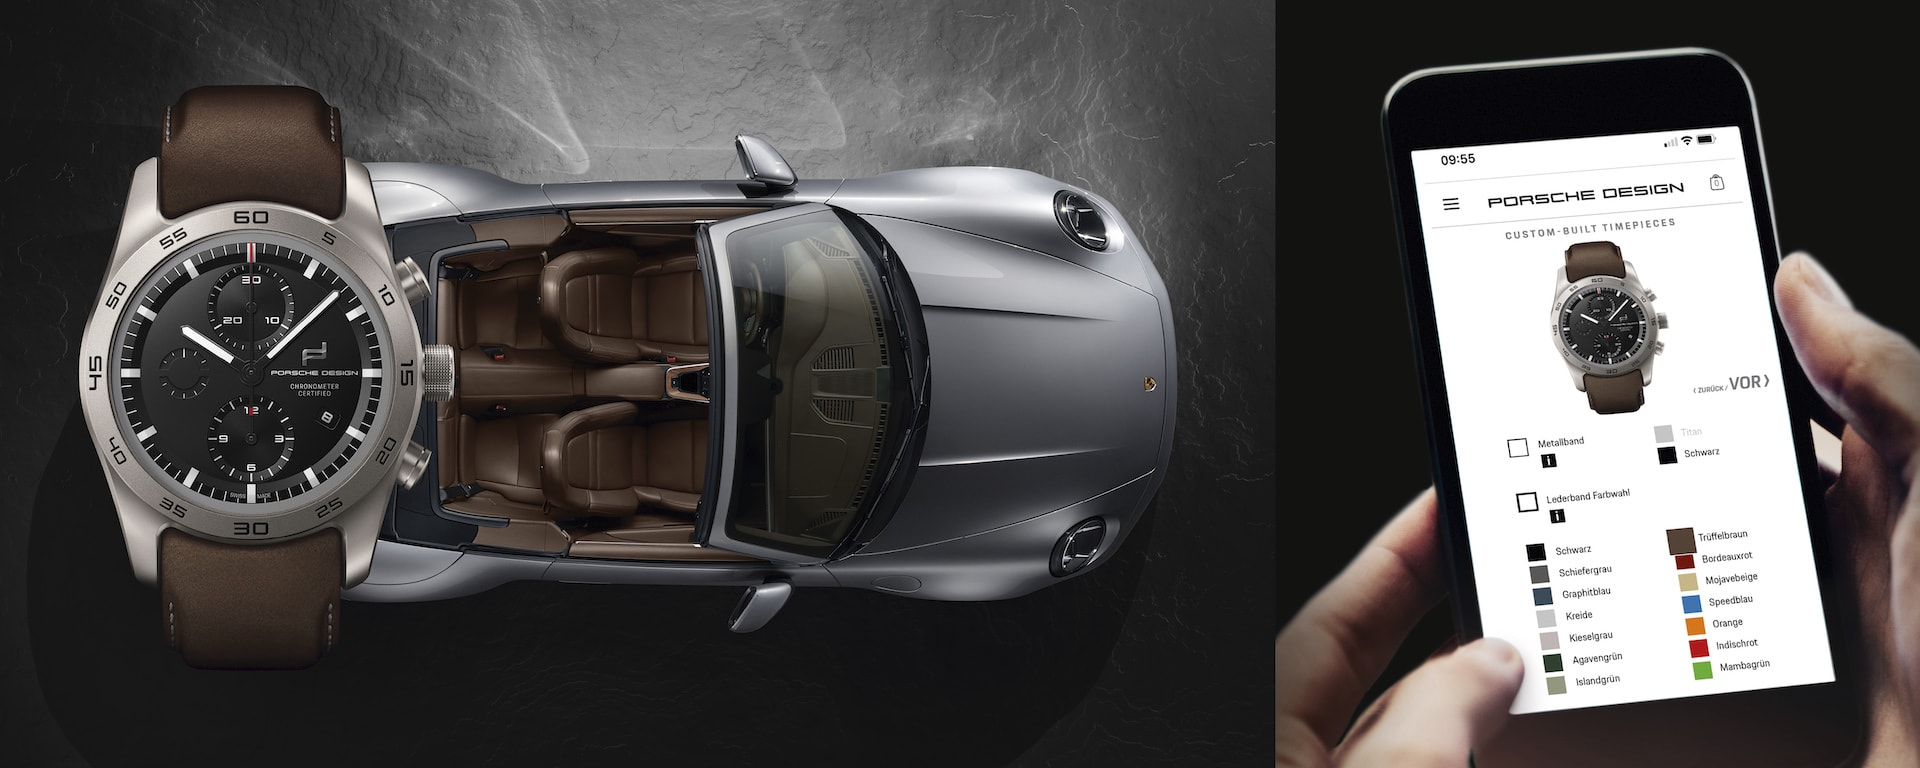 Porsche Design presents a unique Custom-Built Timepieces Program 6